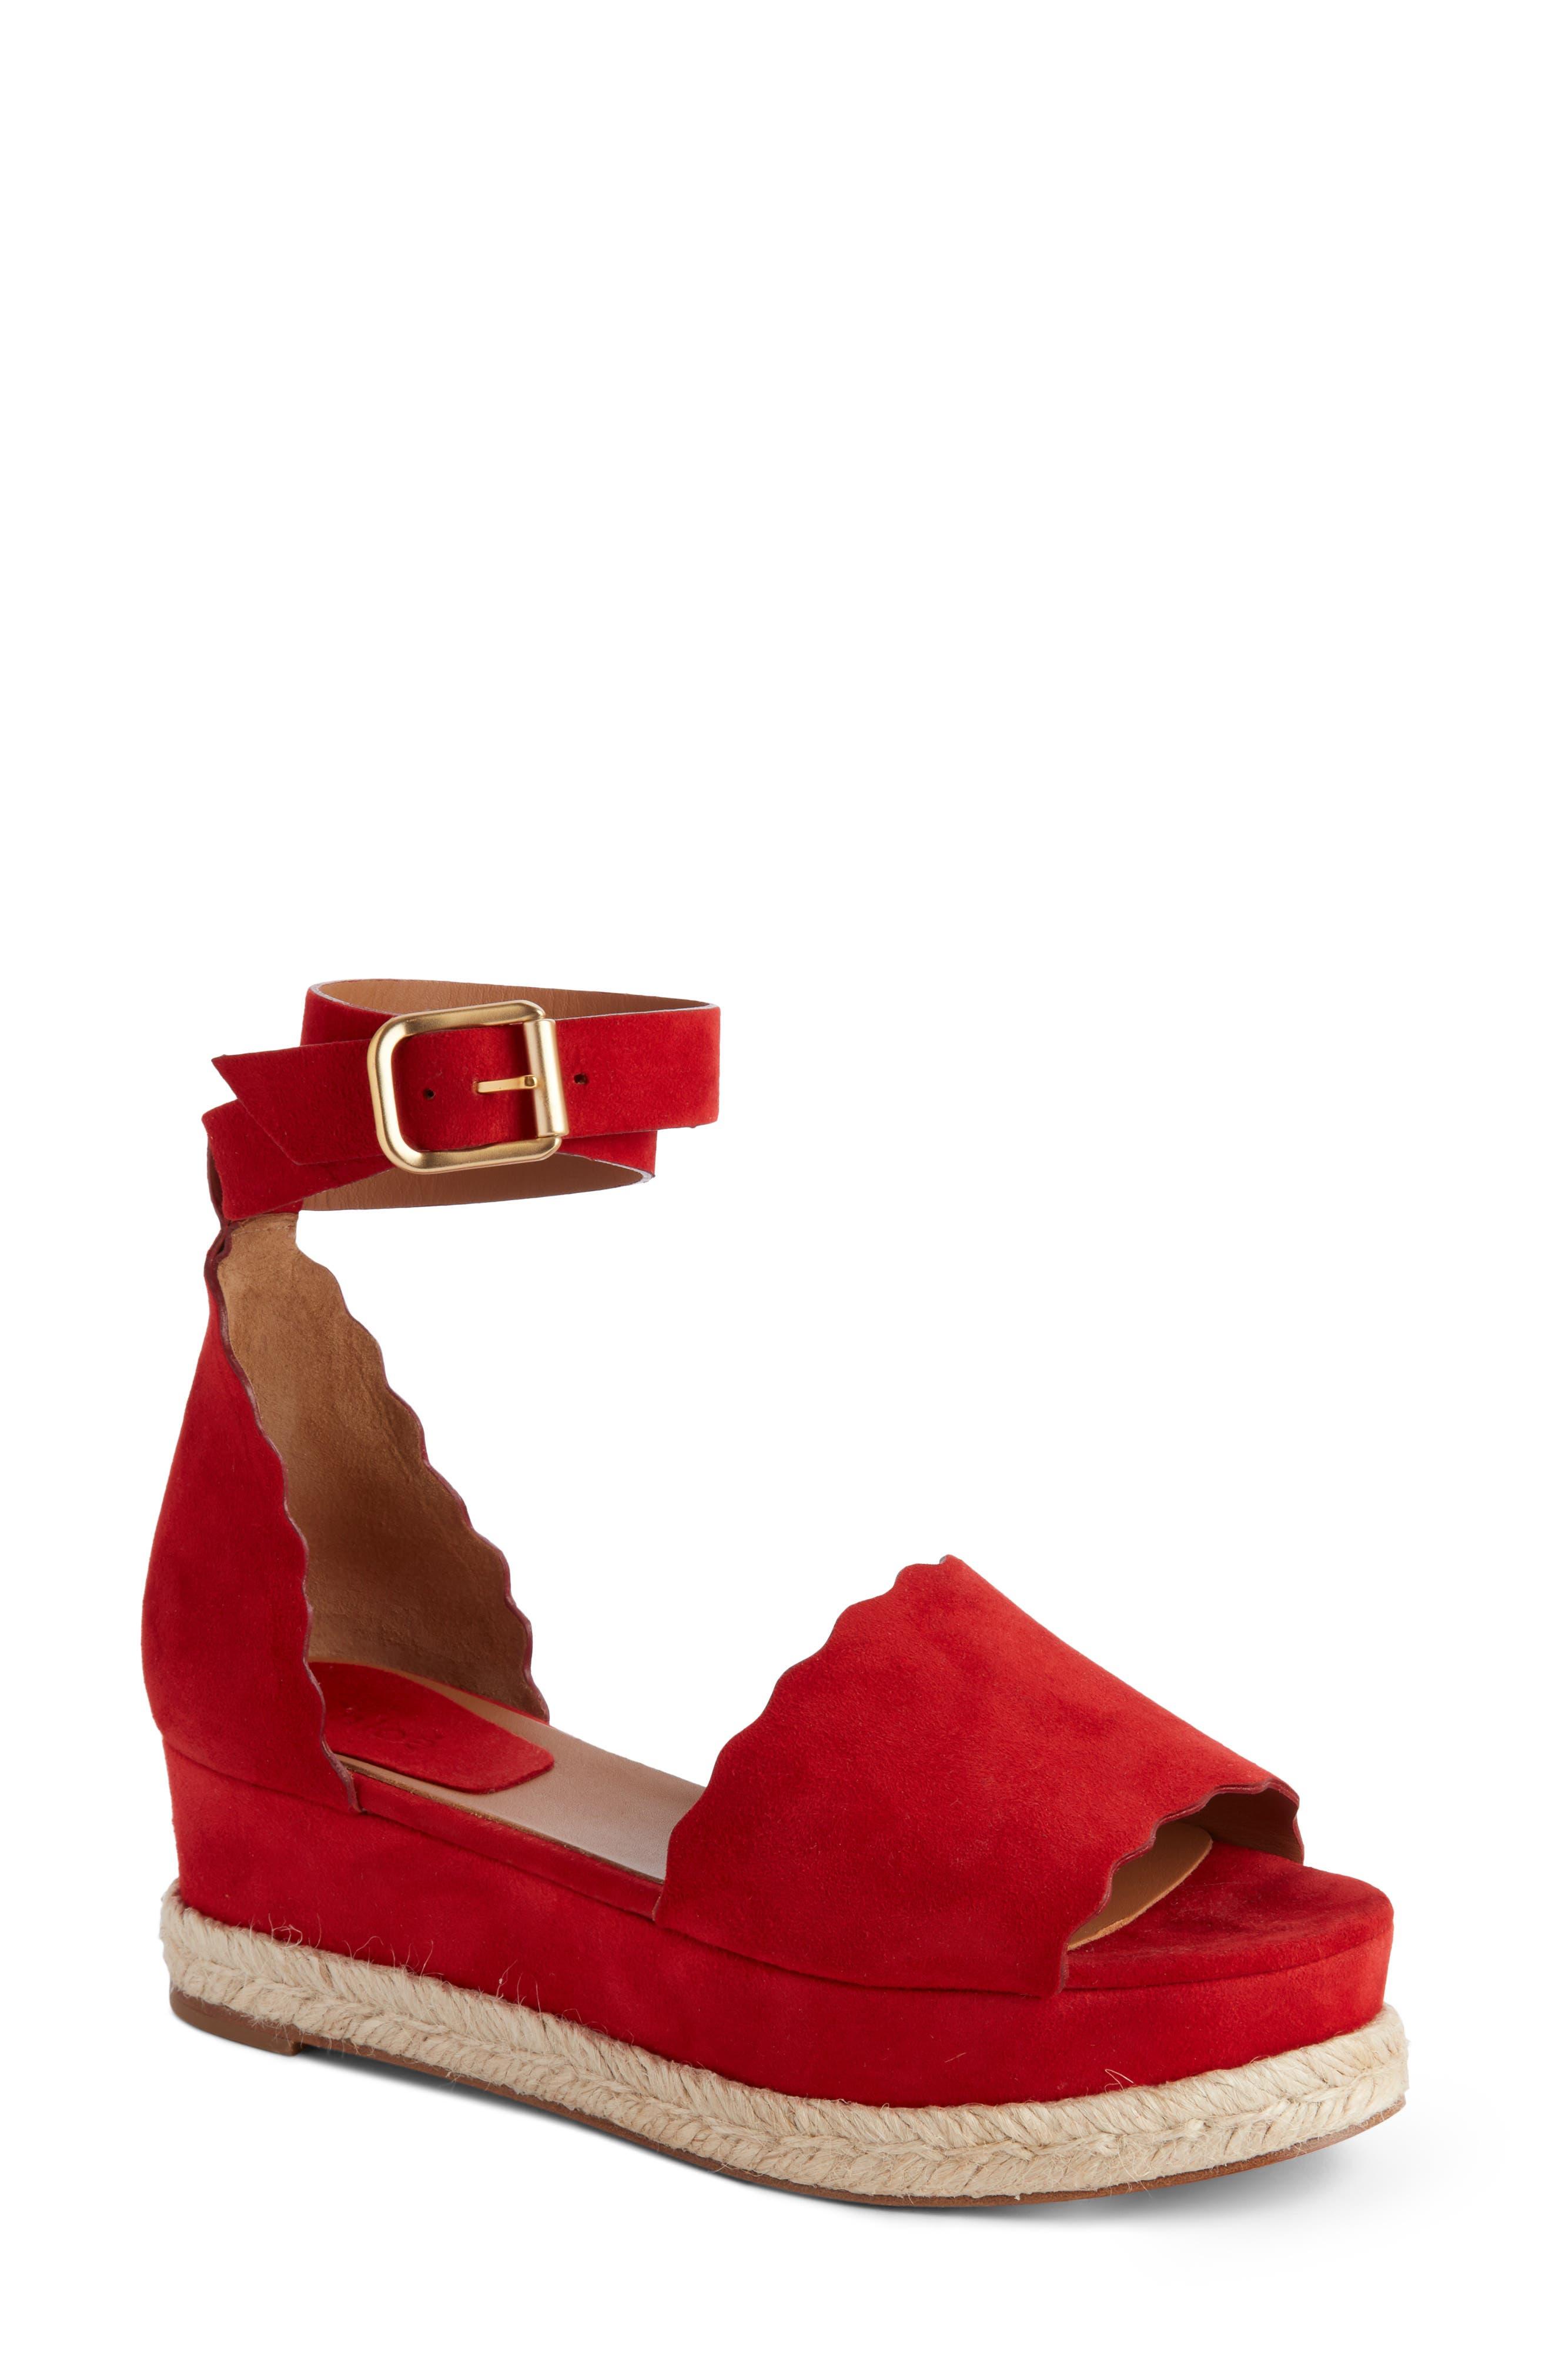 Lauren Espadrille Wedge Sandal,                         Main,                         color, Red Flame